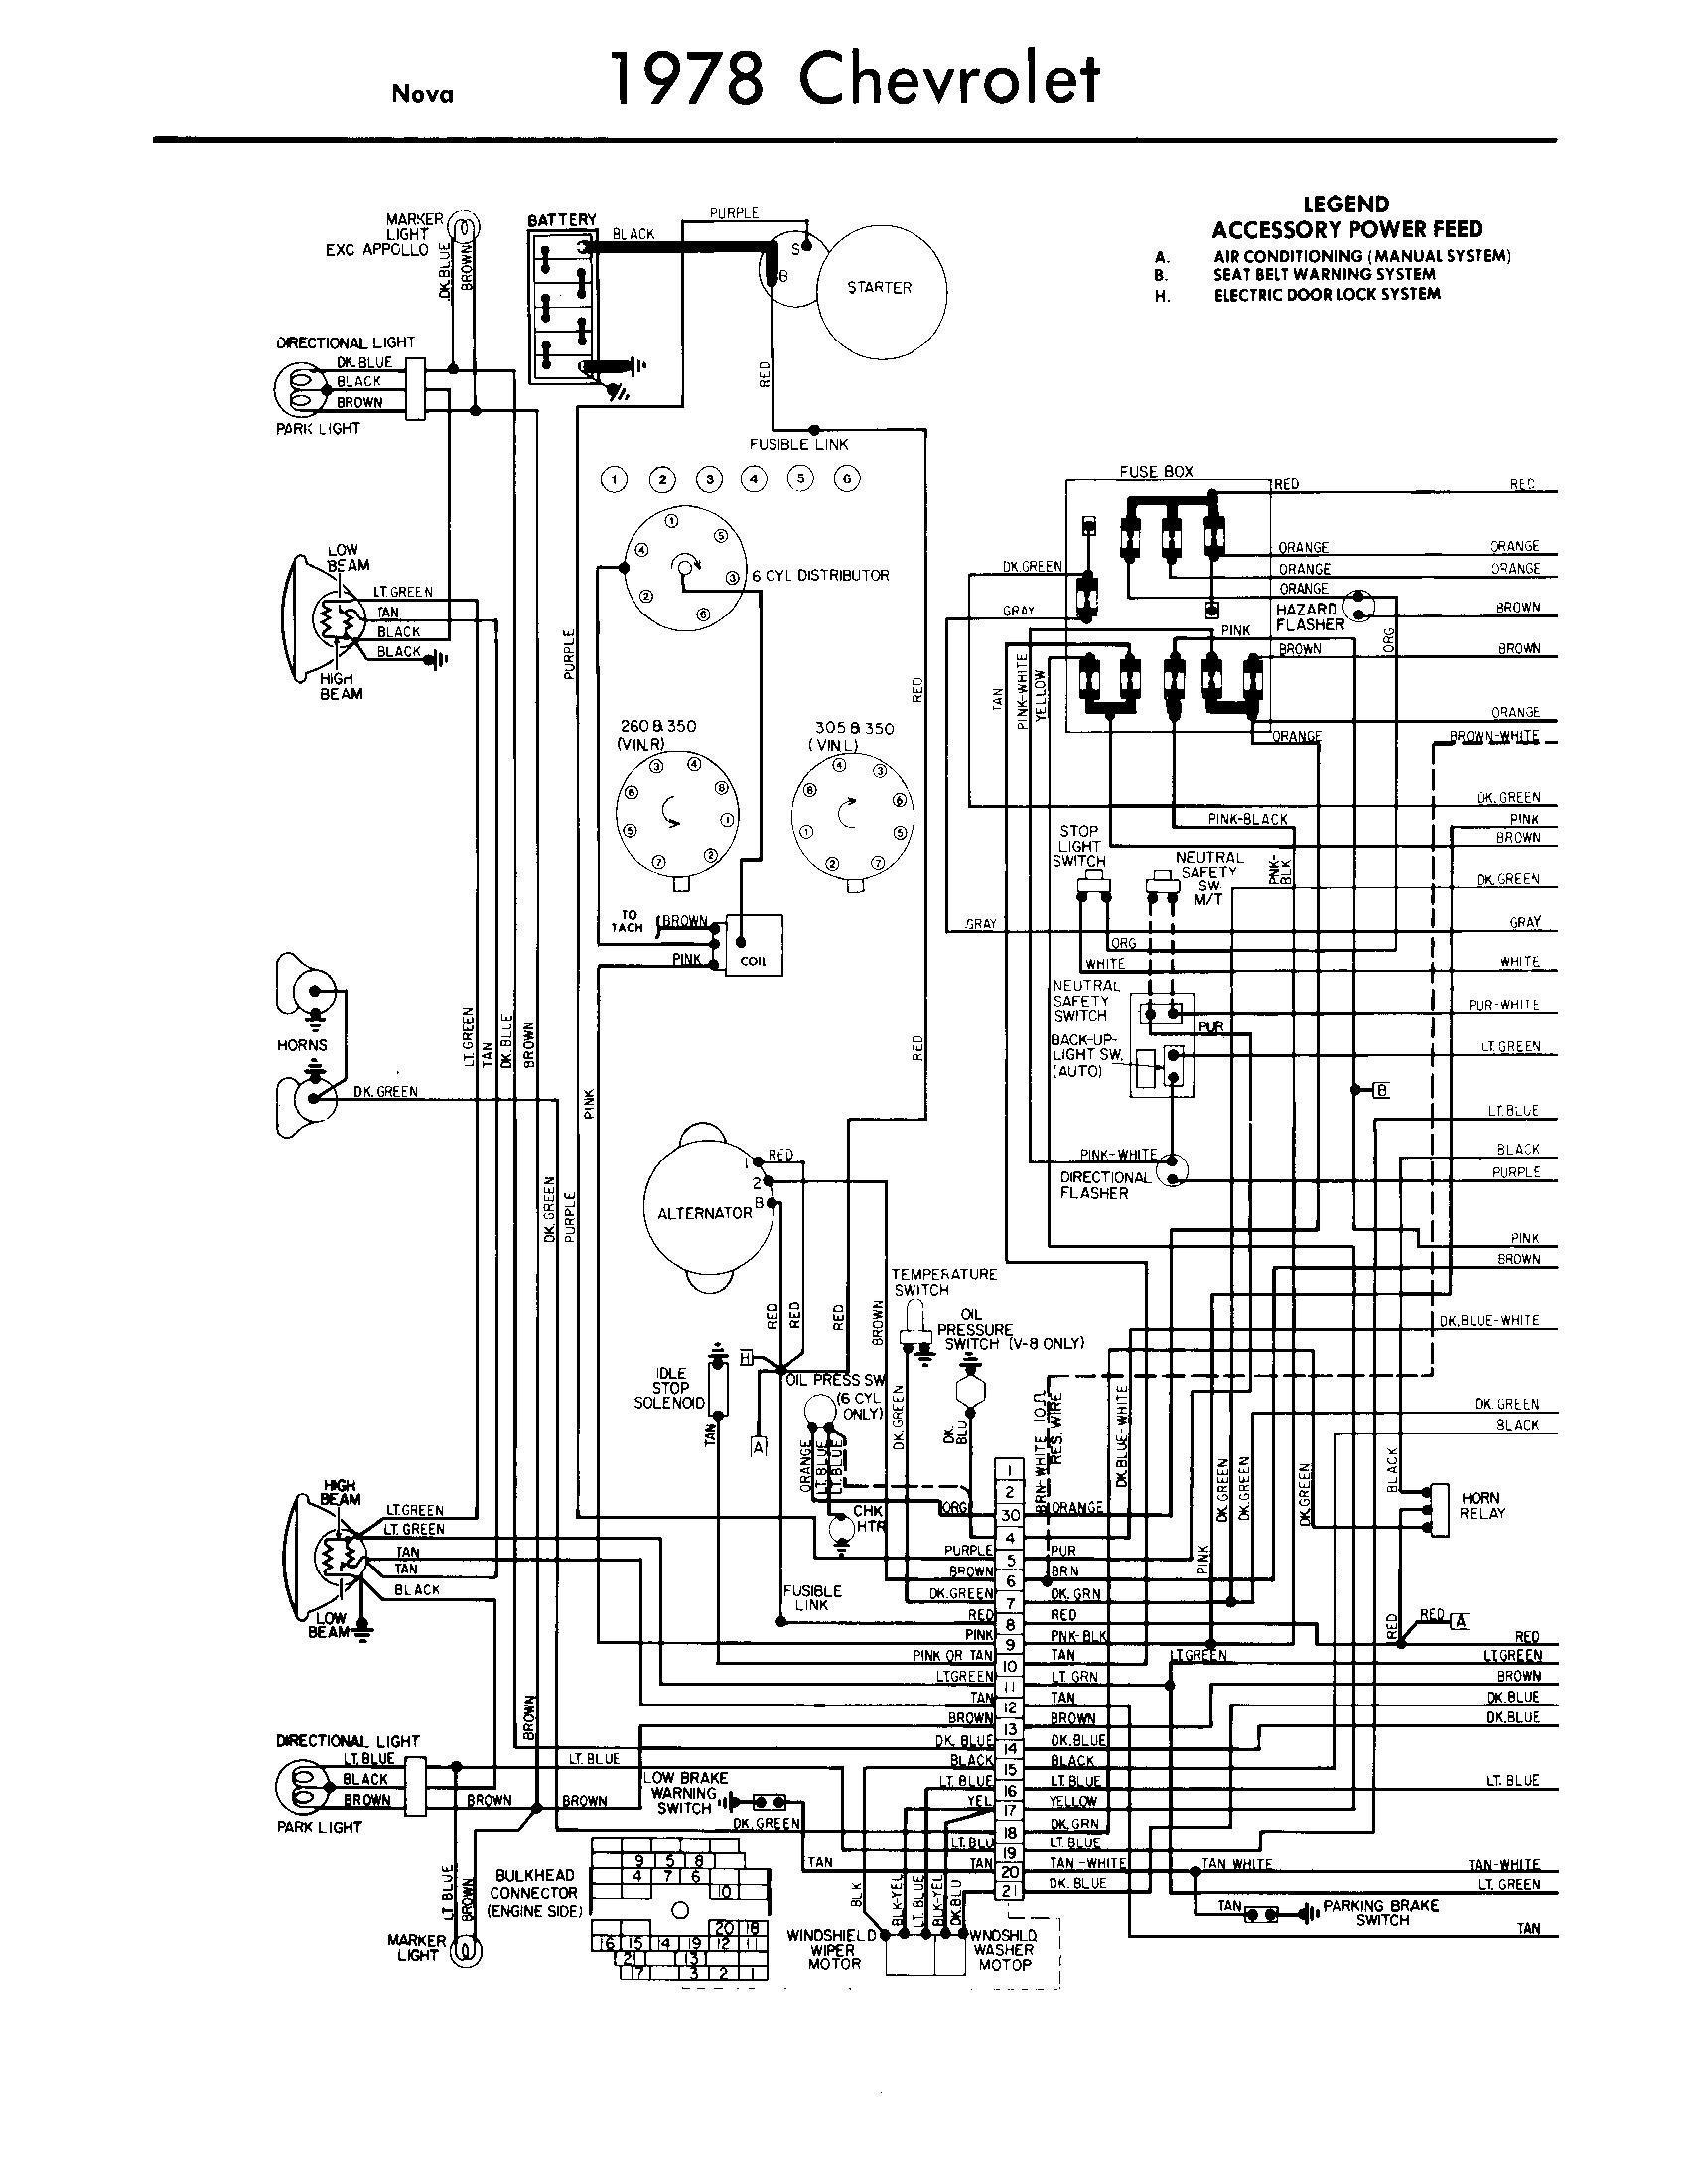 bz 2141  corvette steering column diagram on rear chevy truck steering wheel schematic wiring